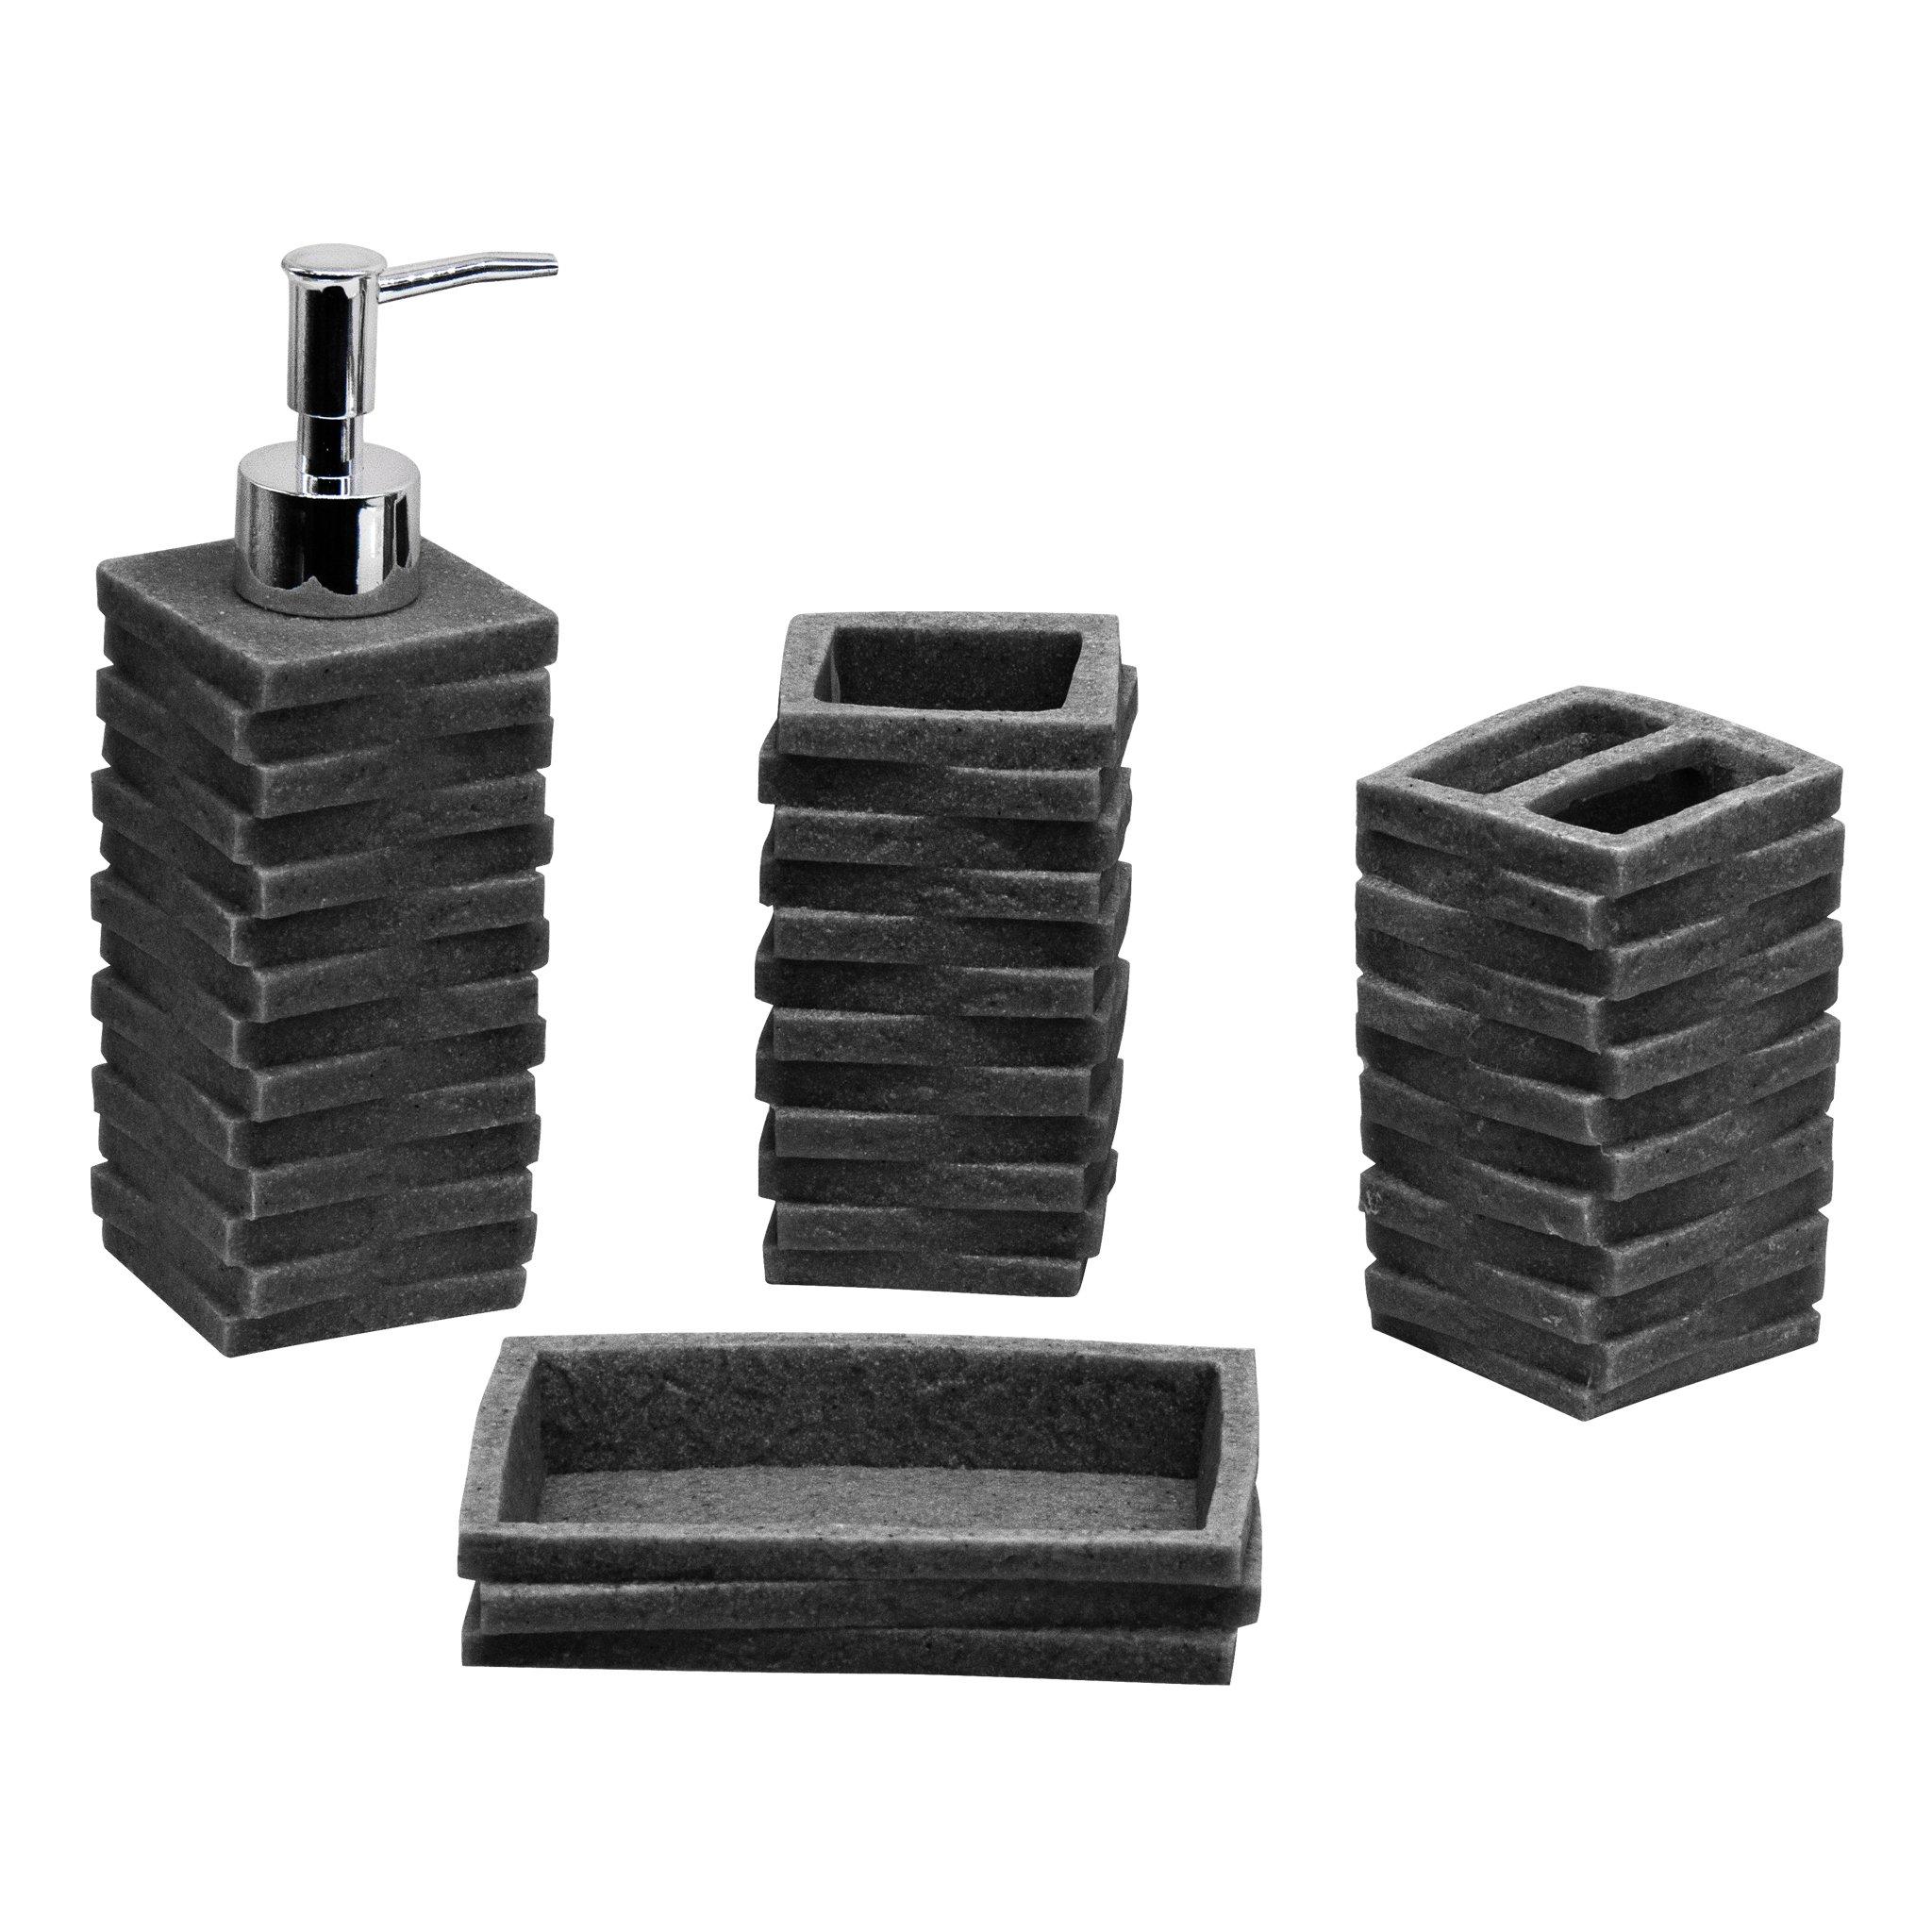 4pc Bathroom Accessories Set   Toothbrush Holder, Soap Dish, Soap/Lotion  Dispenser,